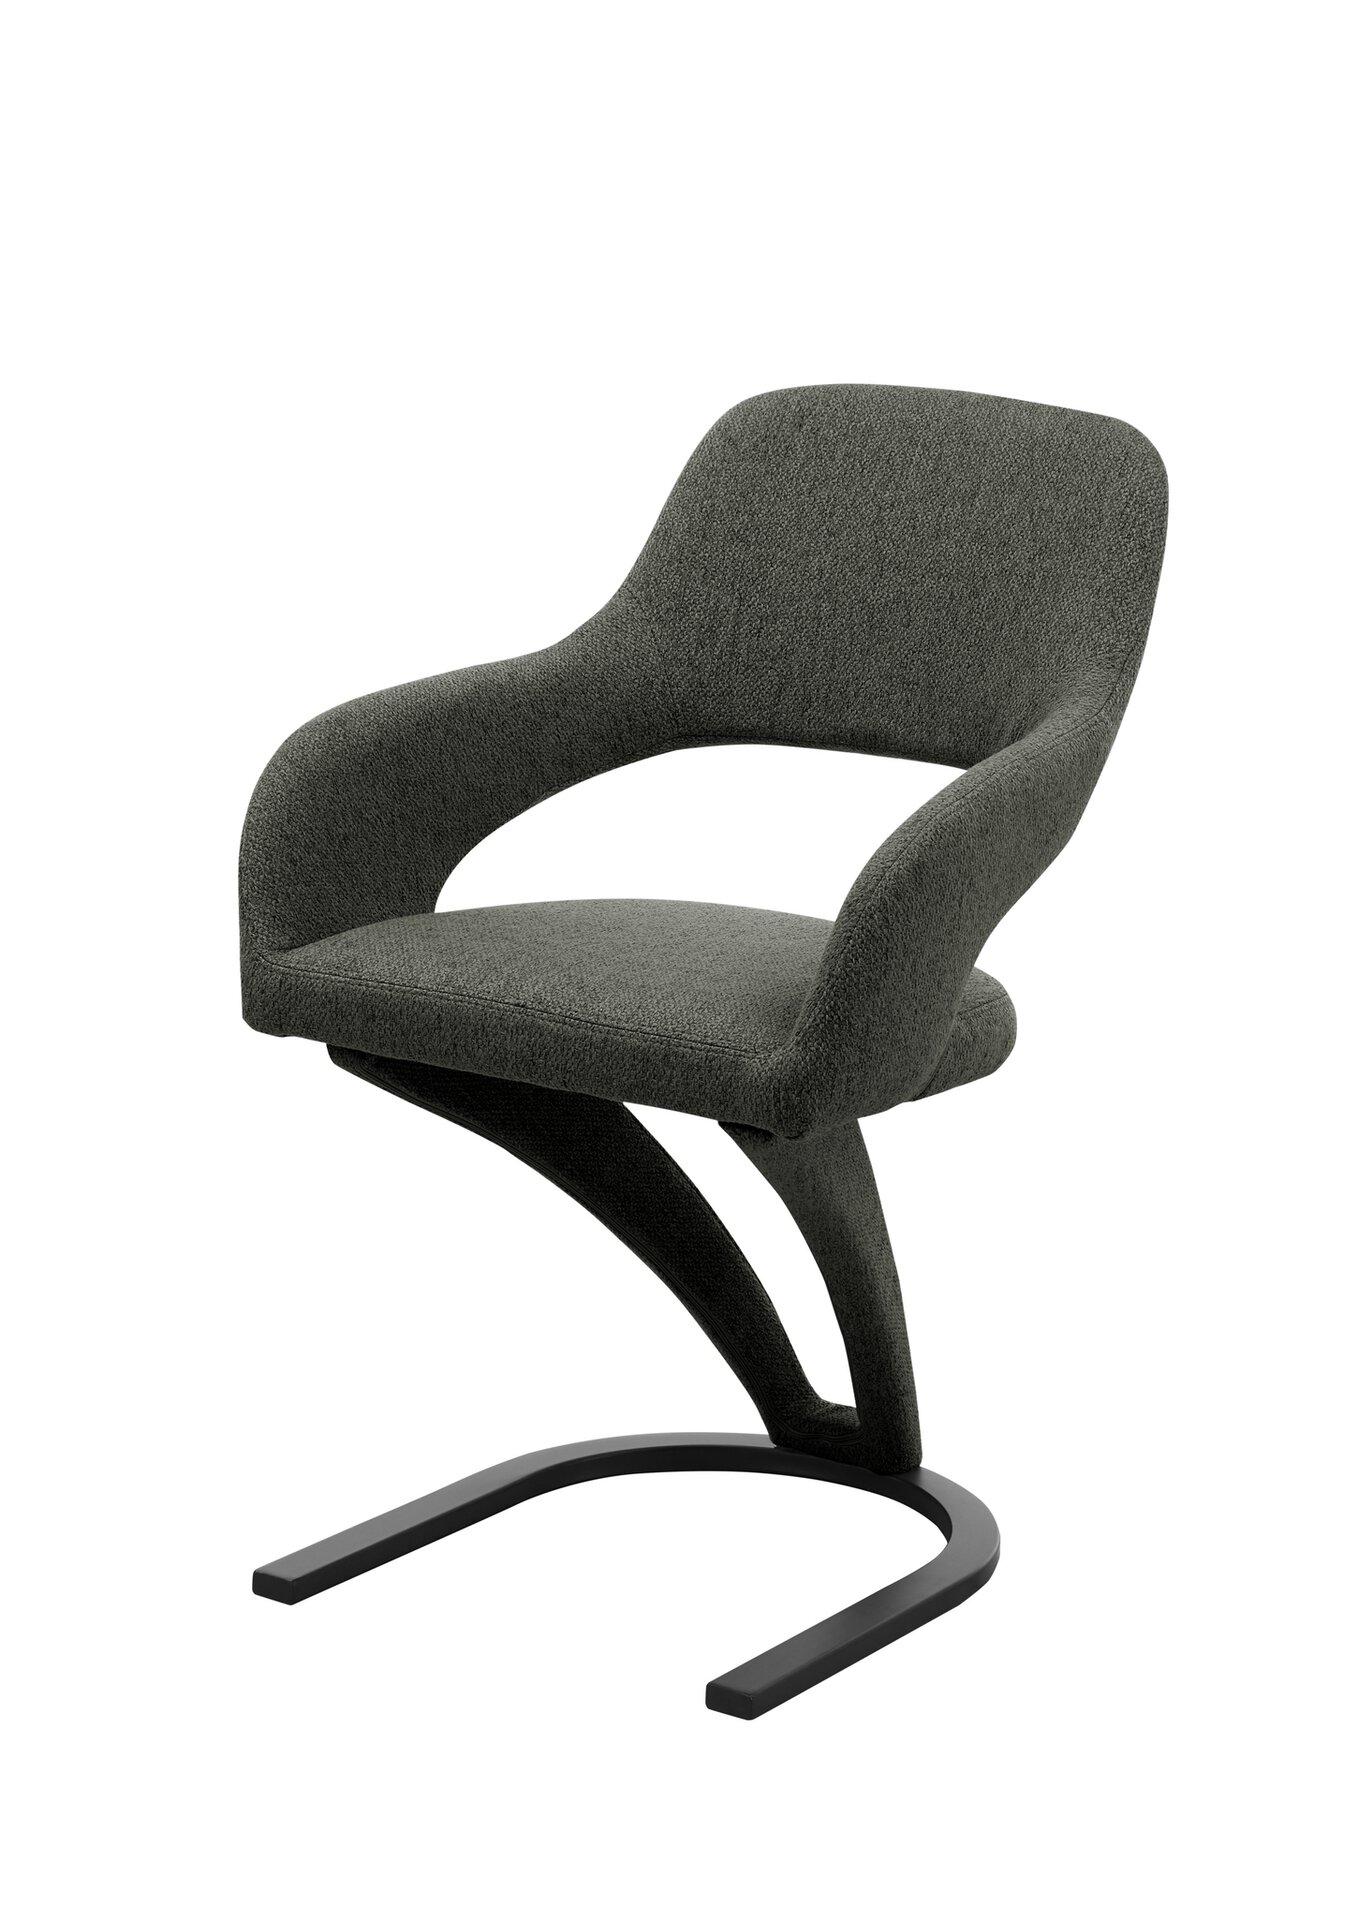 Stuhl CROSBY Vito Textil mehrfarbig 65 x 86 x 56 cm